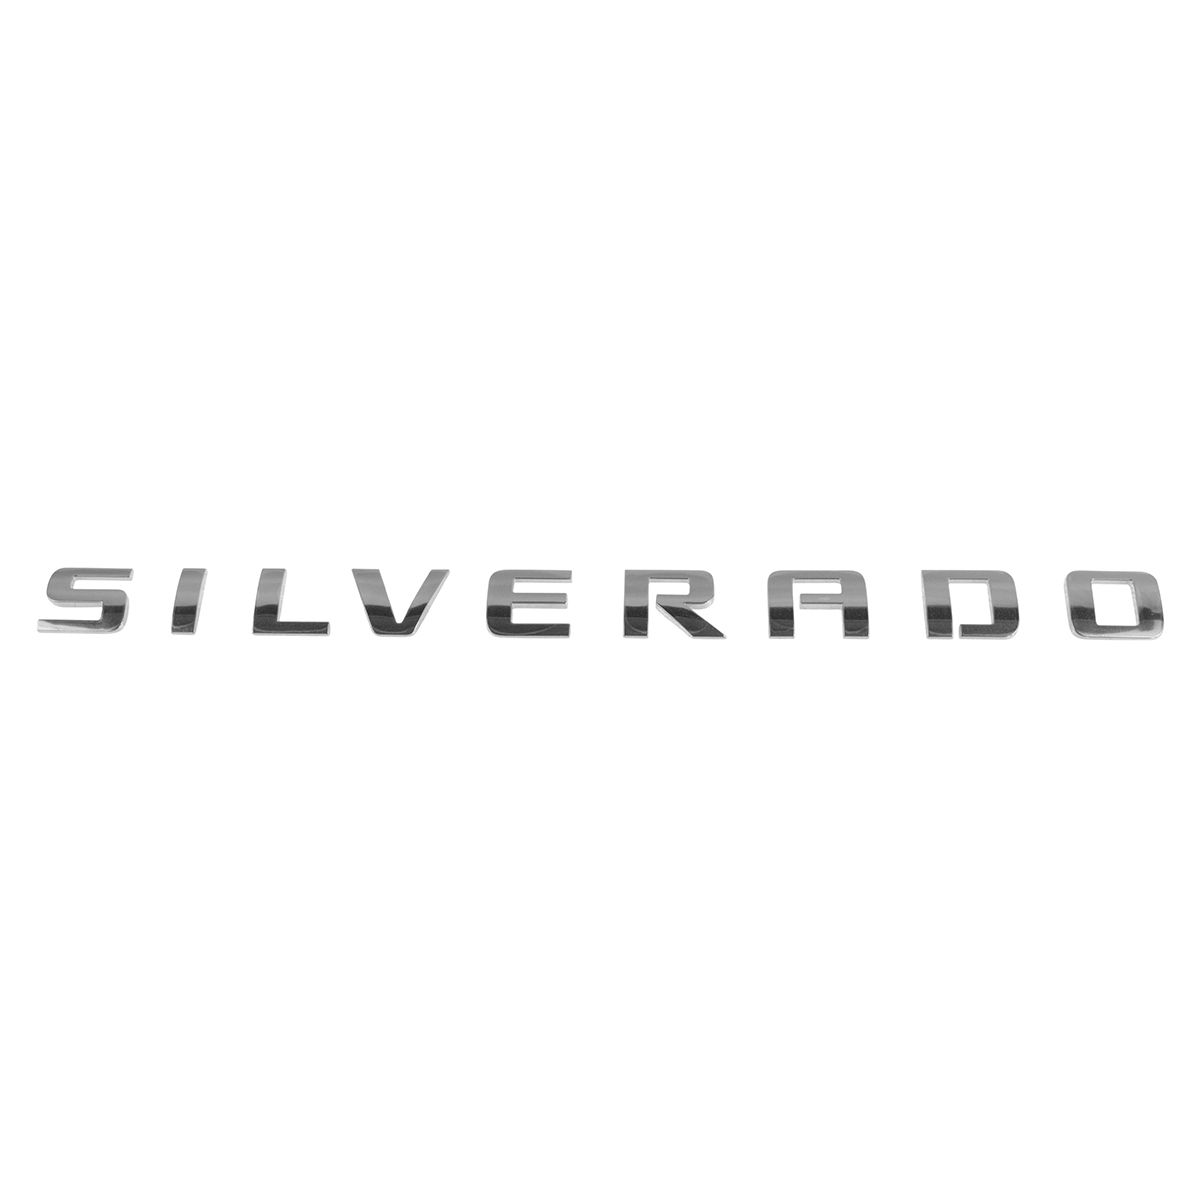 Chrome 1 Pcs Letter Sierra Nameplate Emblem 3D Plastic Badge Replacement for Gm 2500HD 3500HD Sierra